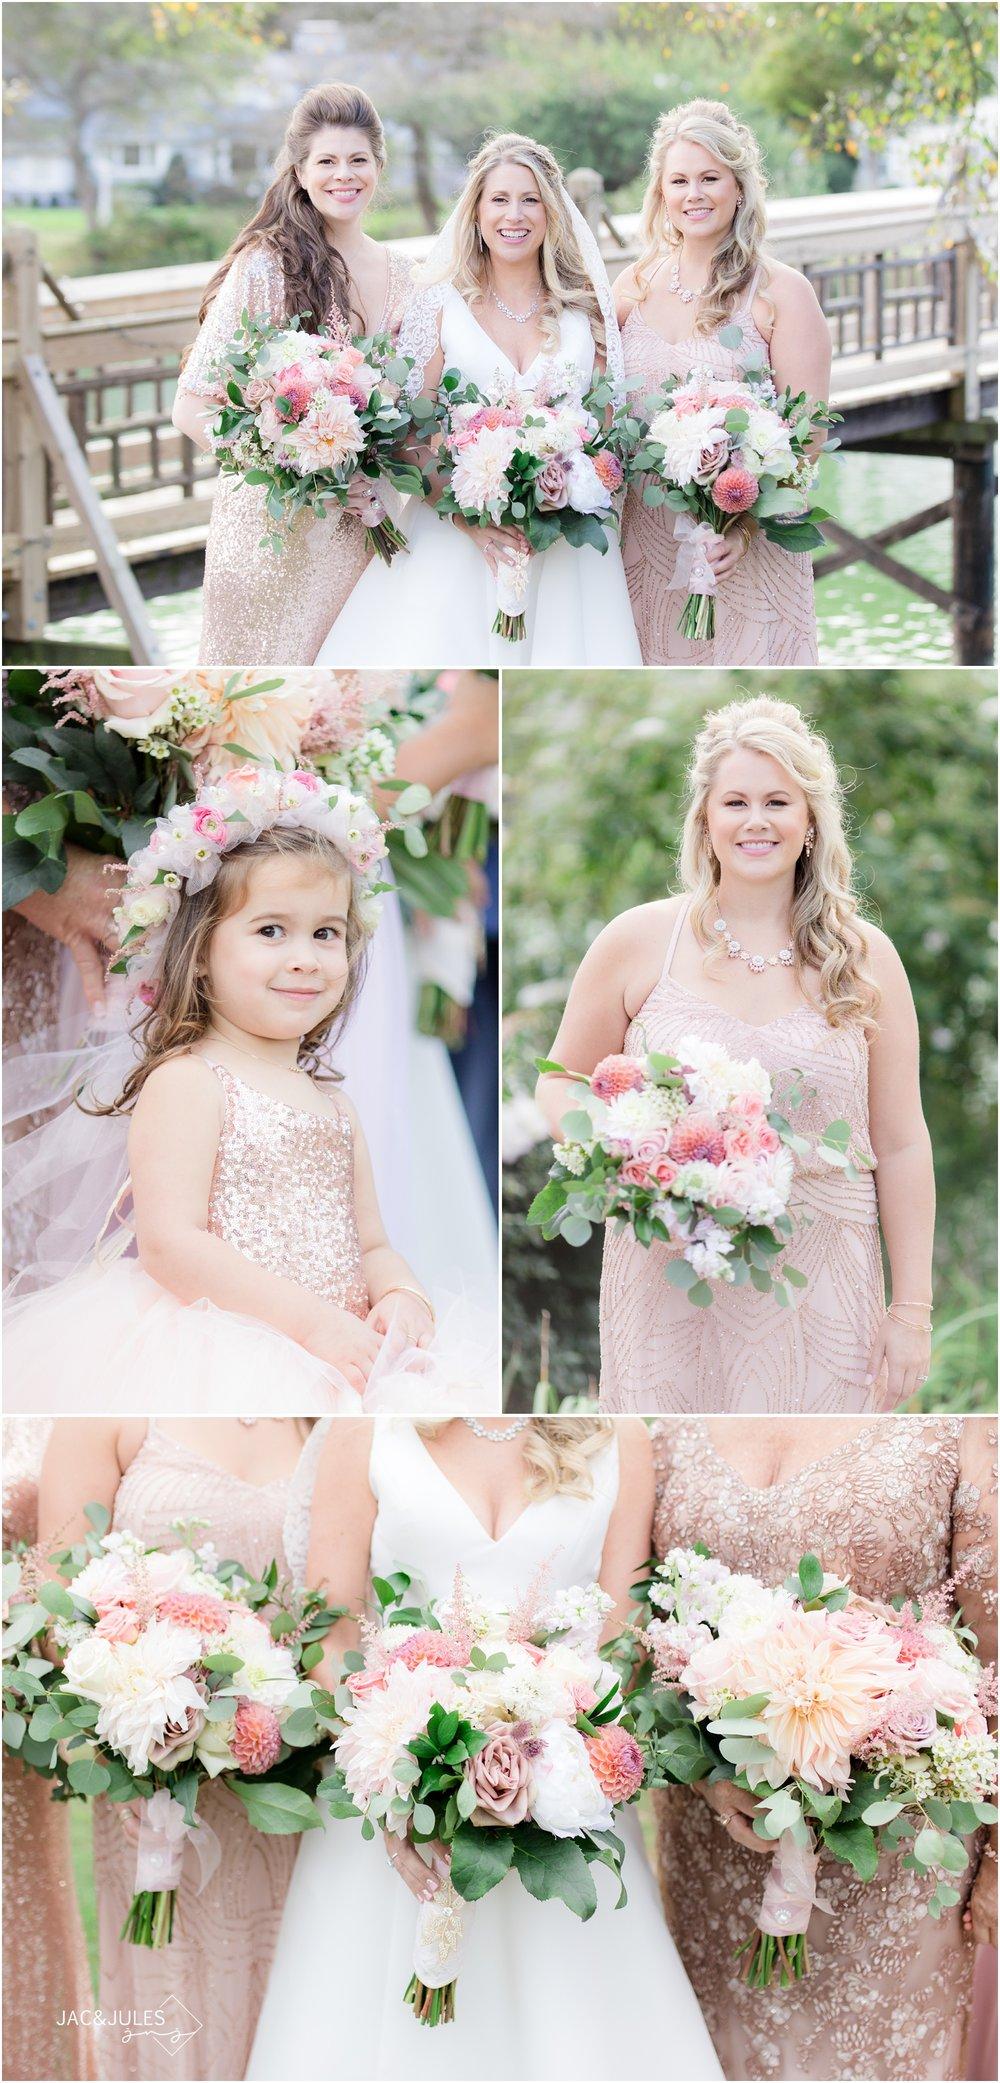 Bridesmaids photos in Devine Park in Spring Lake, NJ.